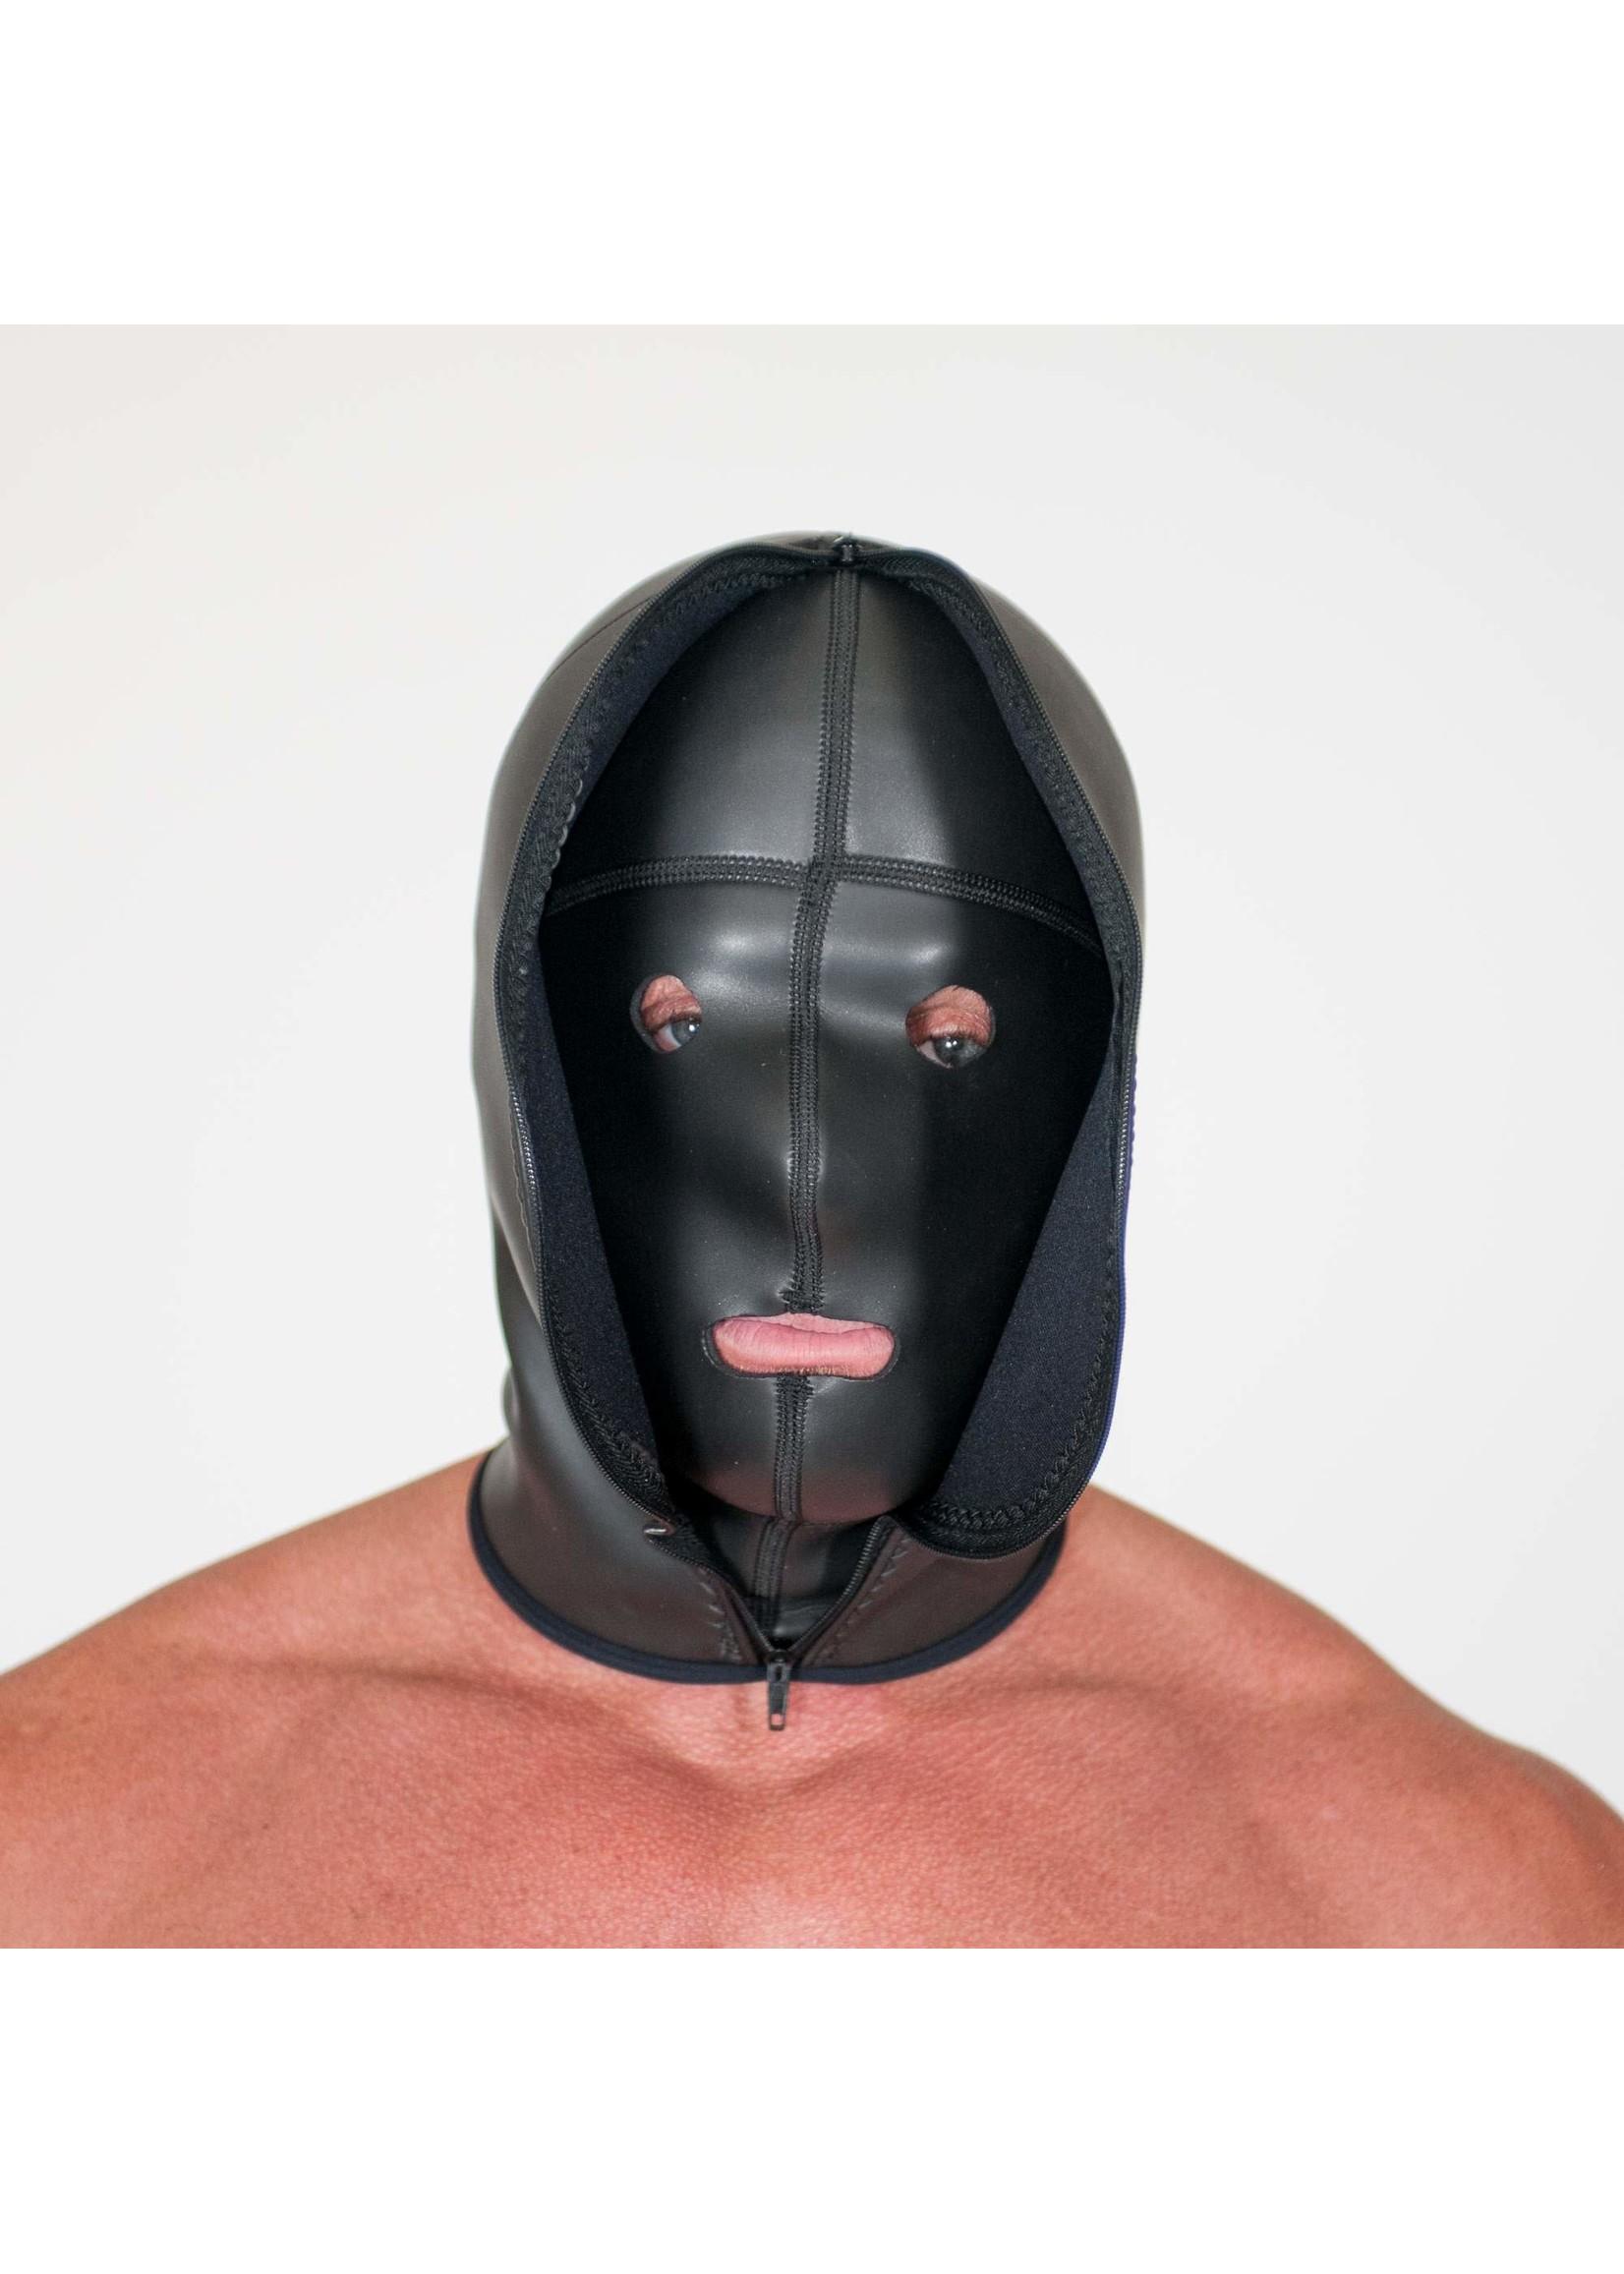 665 Leather 655 Neoprene Confinement Hood